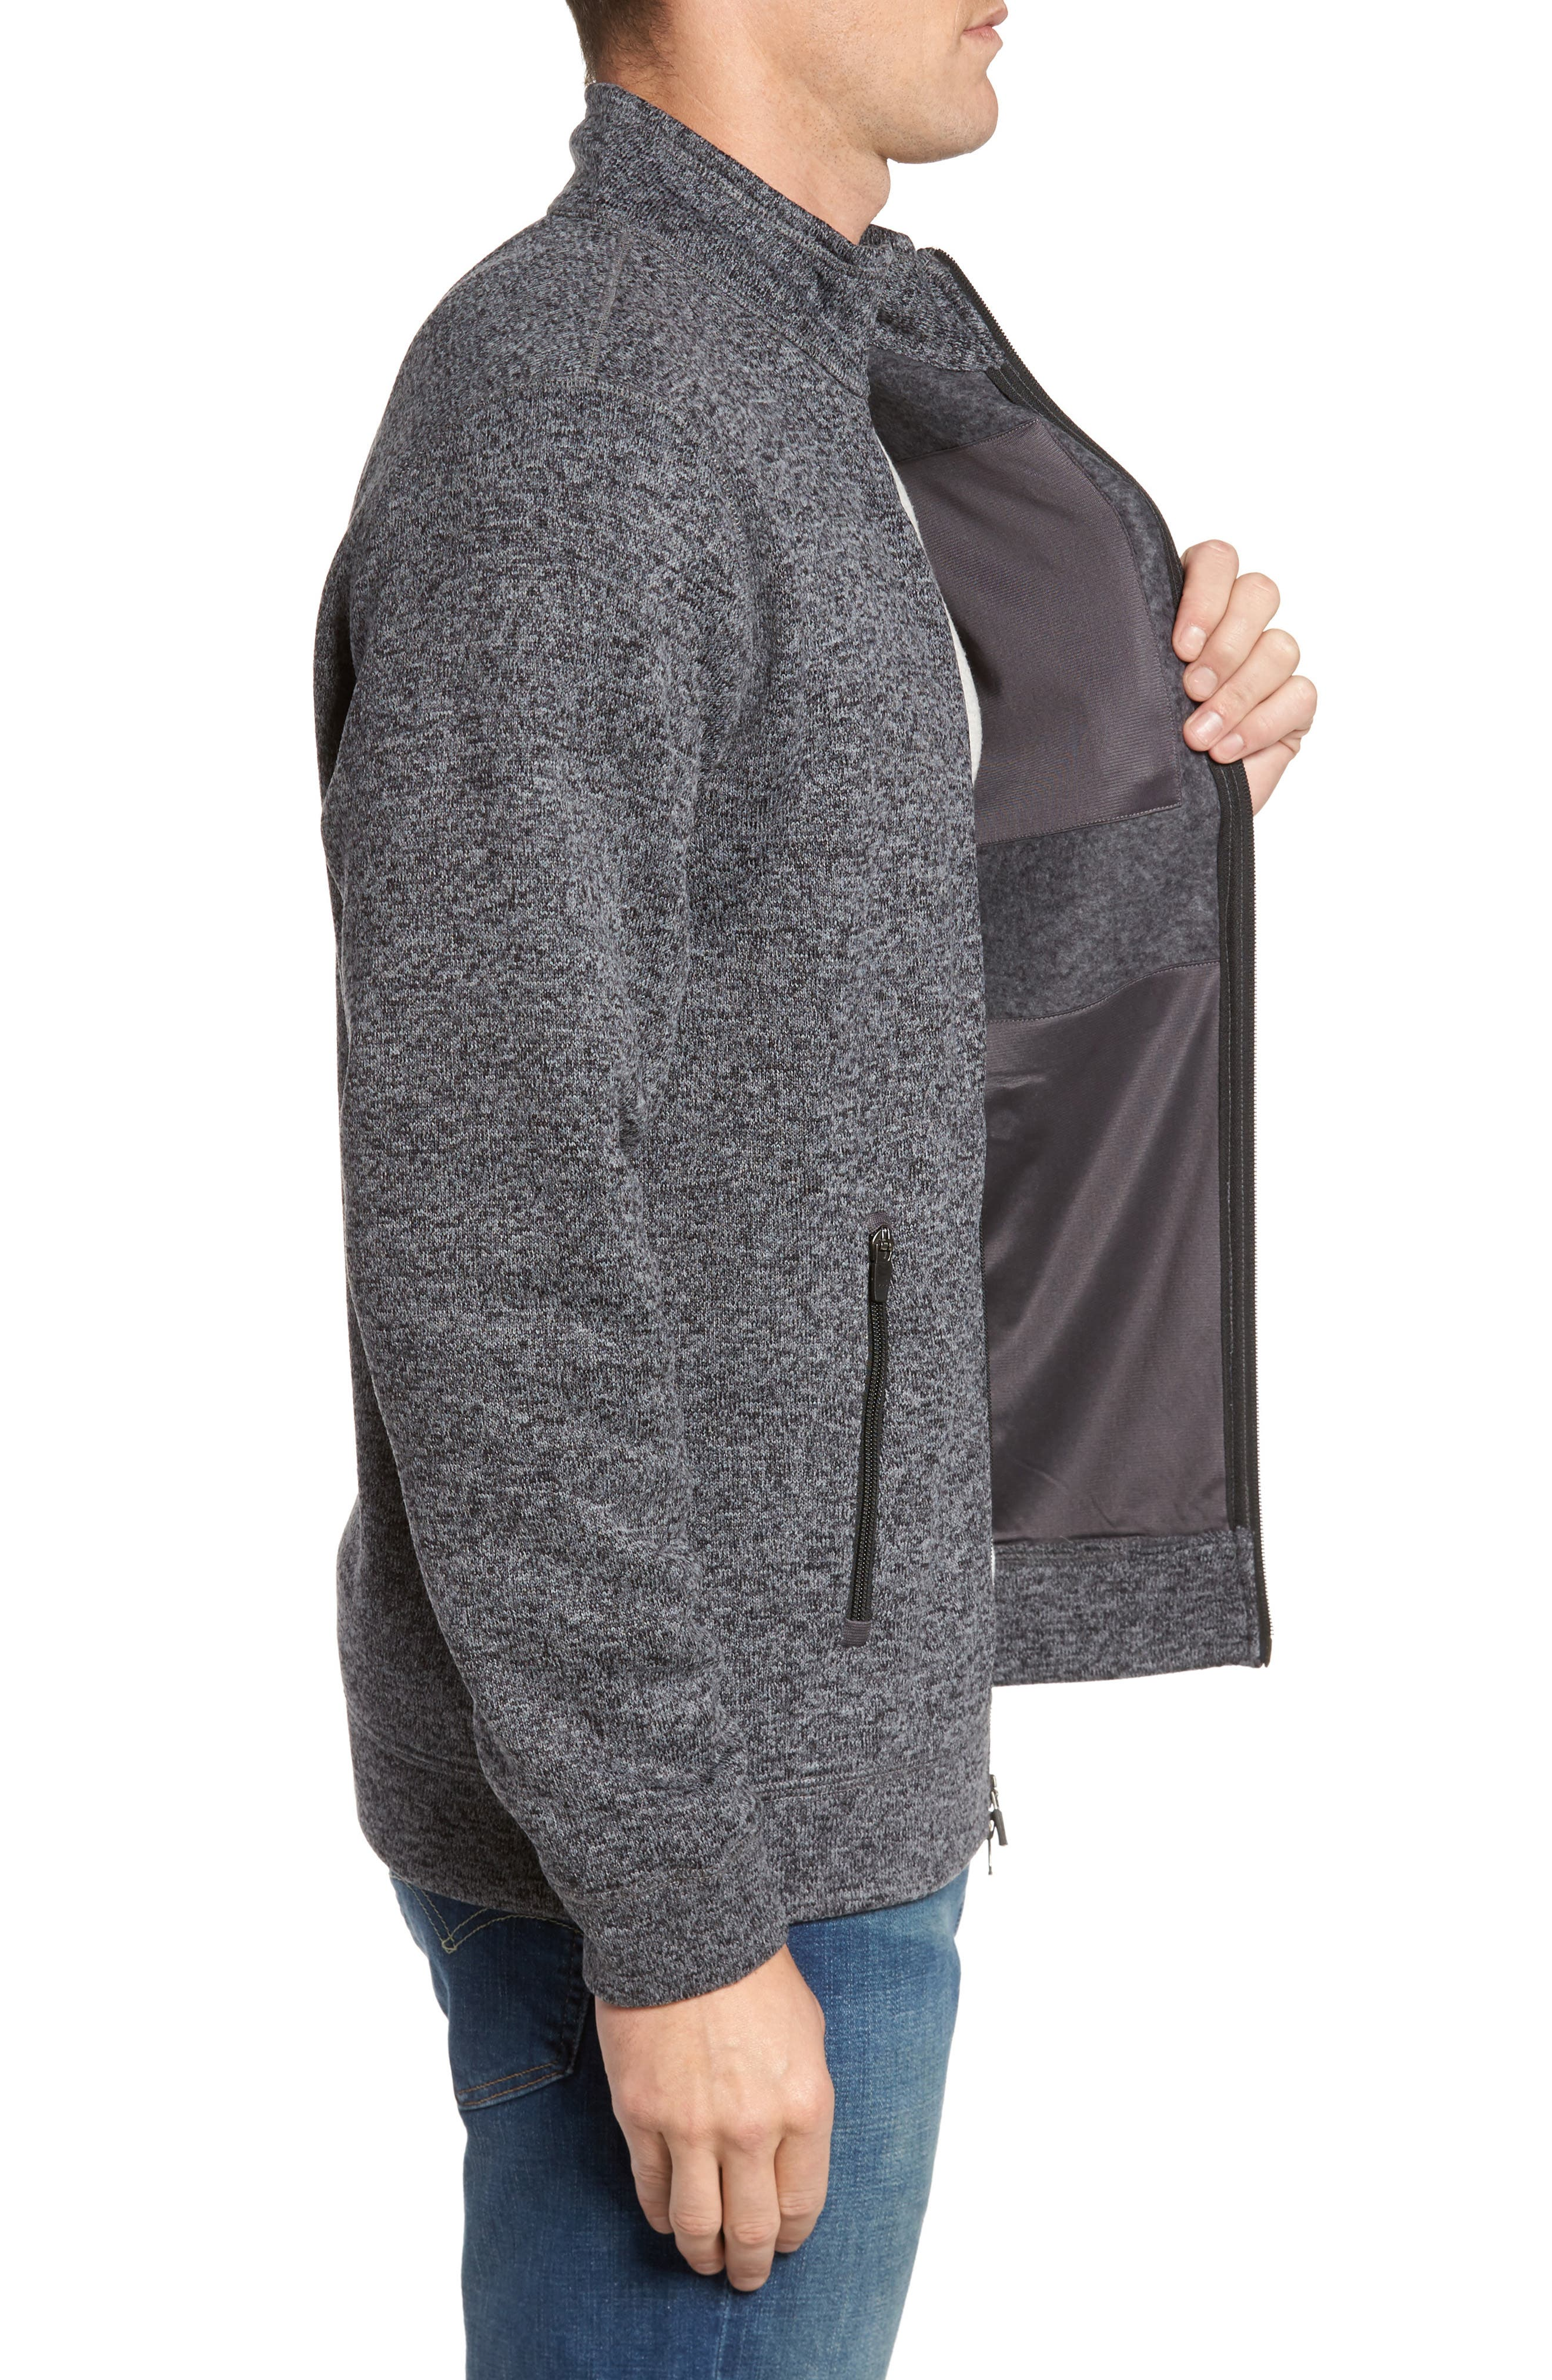 Sweater Knit Fleece Zip Front Jacket,                             Alternate thumbnail 3, color,                             Black/ Grey